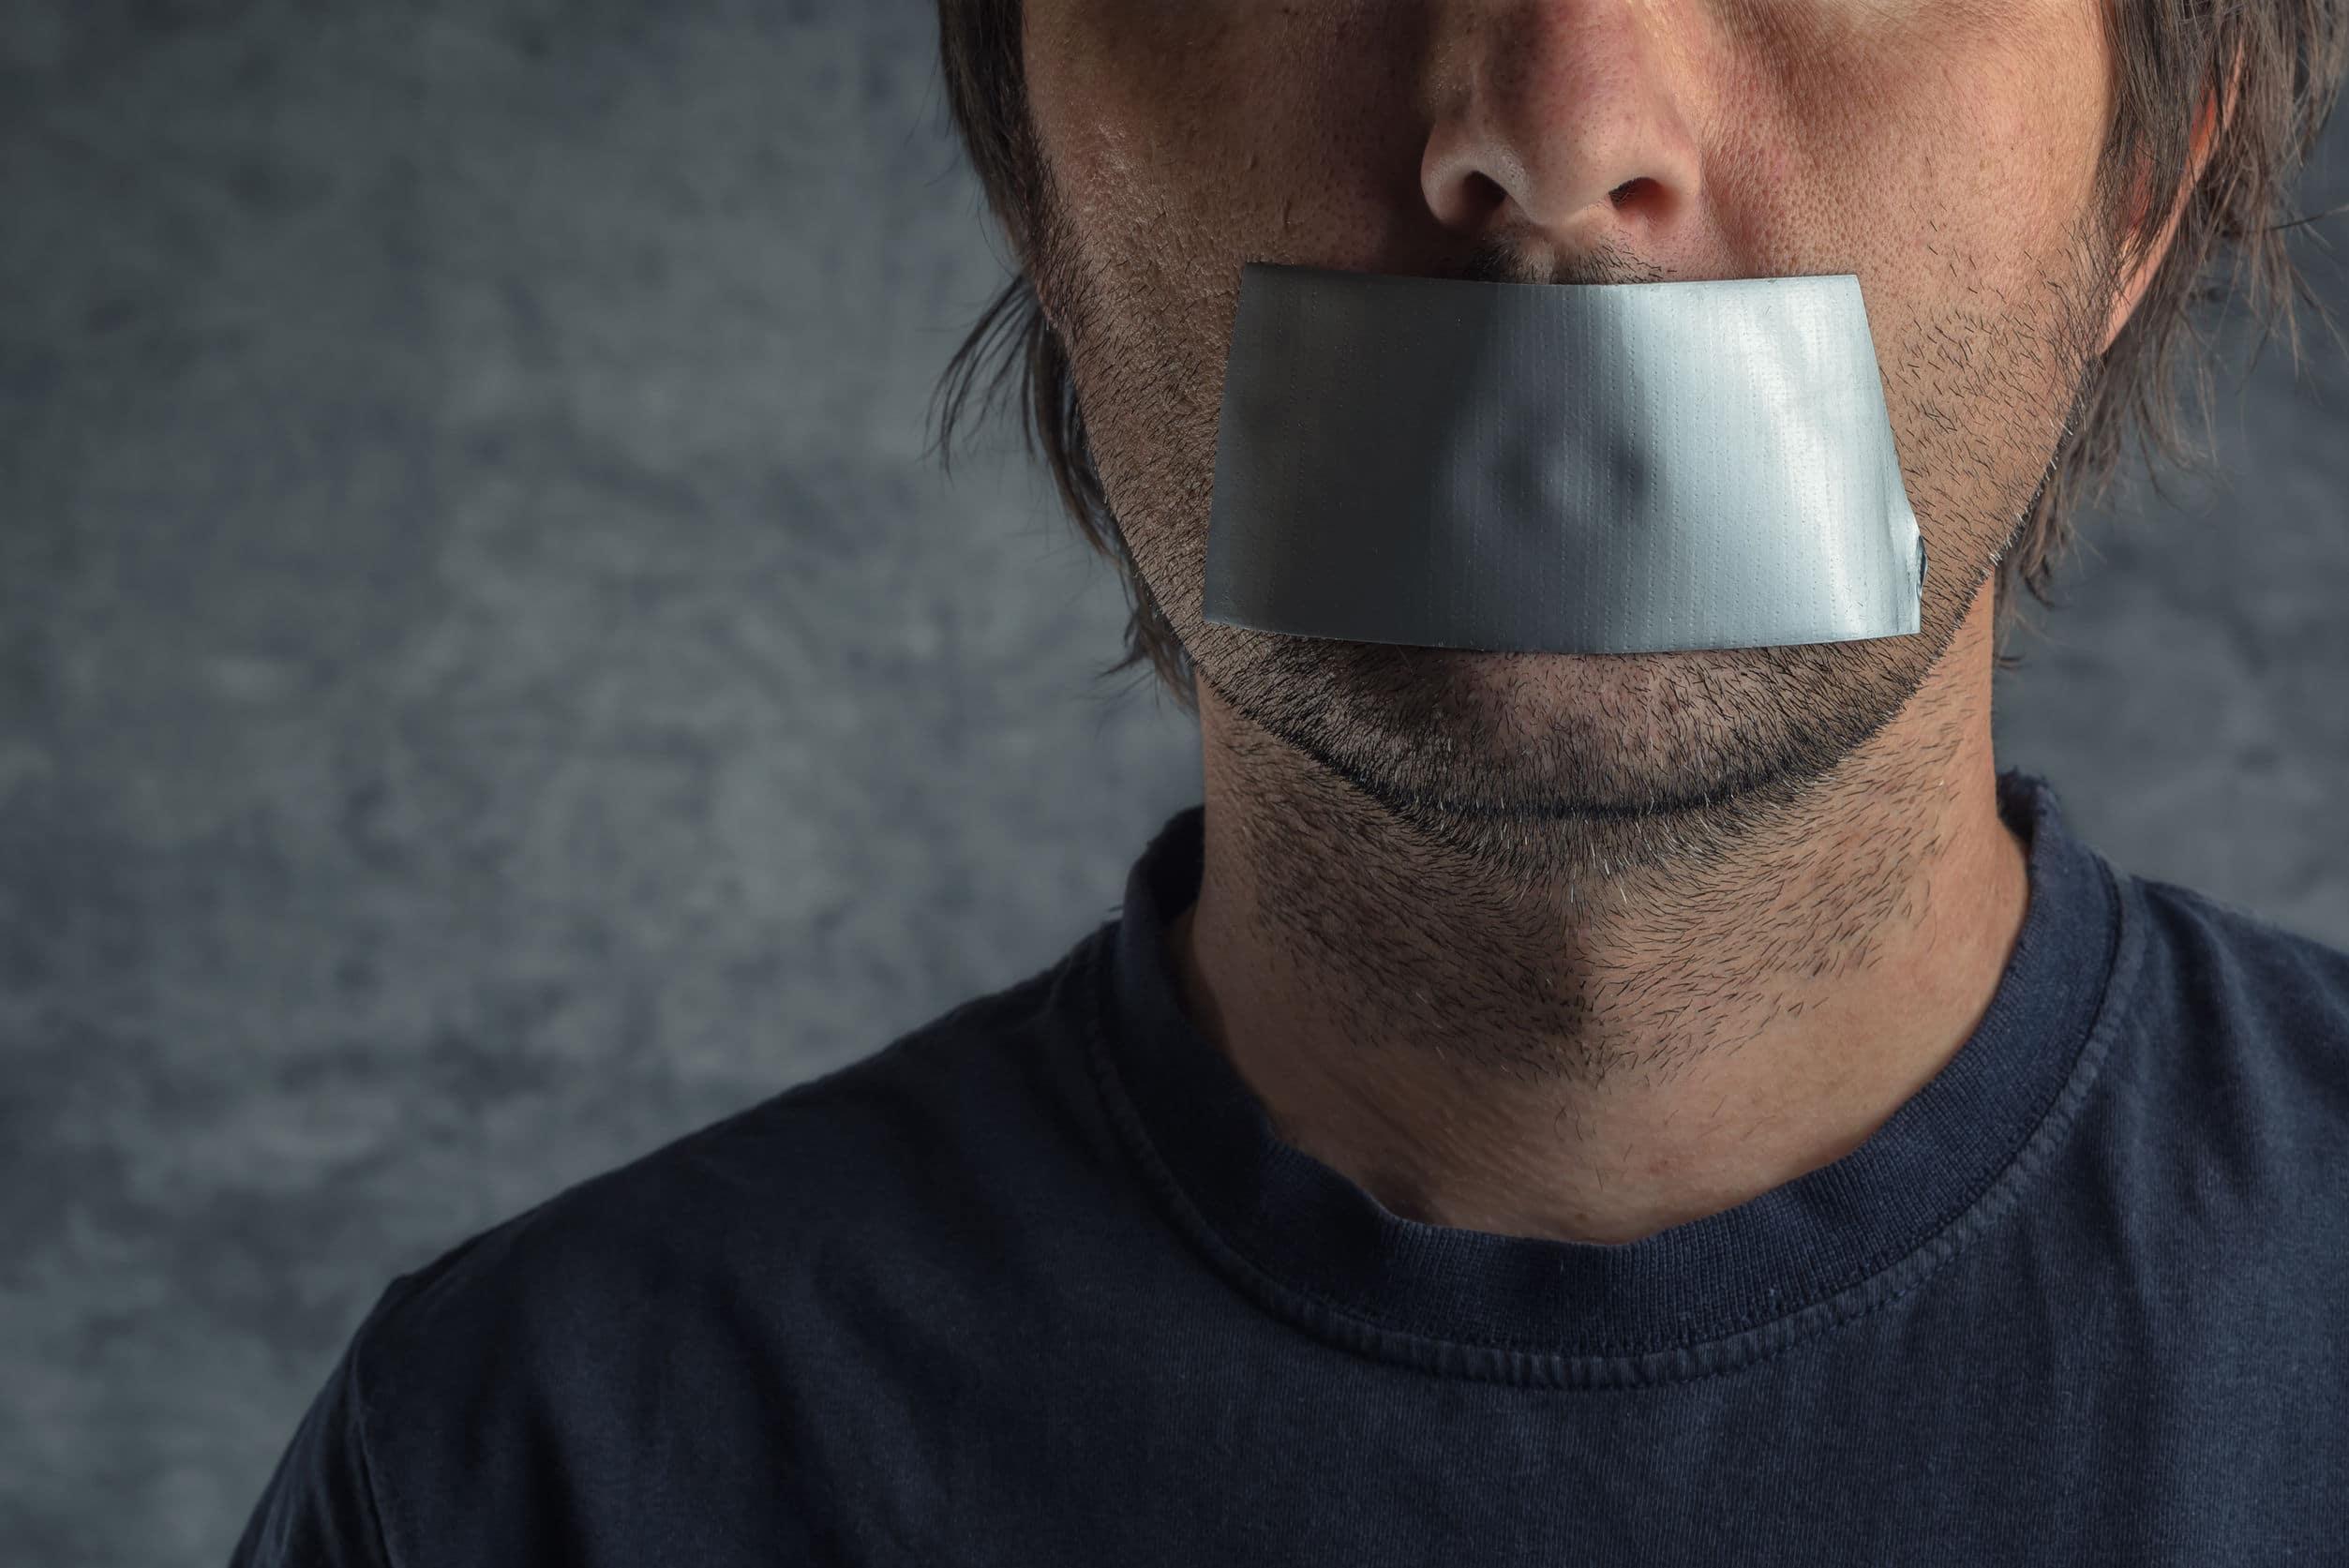 homem caucasiano adulto com fita adesiva na boca para impedi-lo de falar.